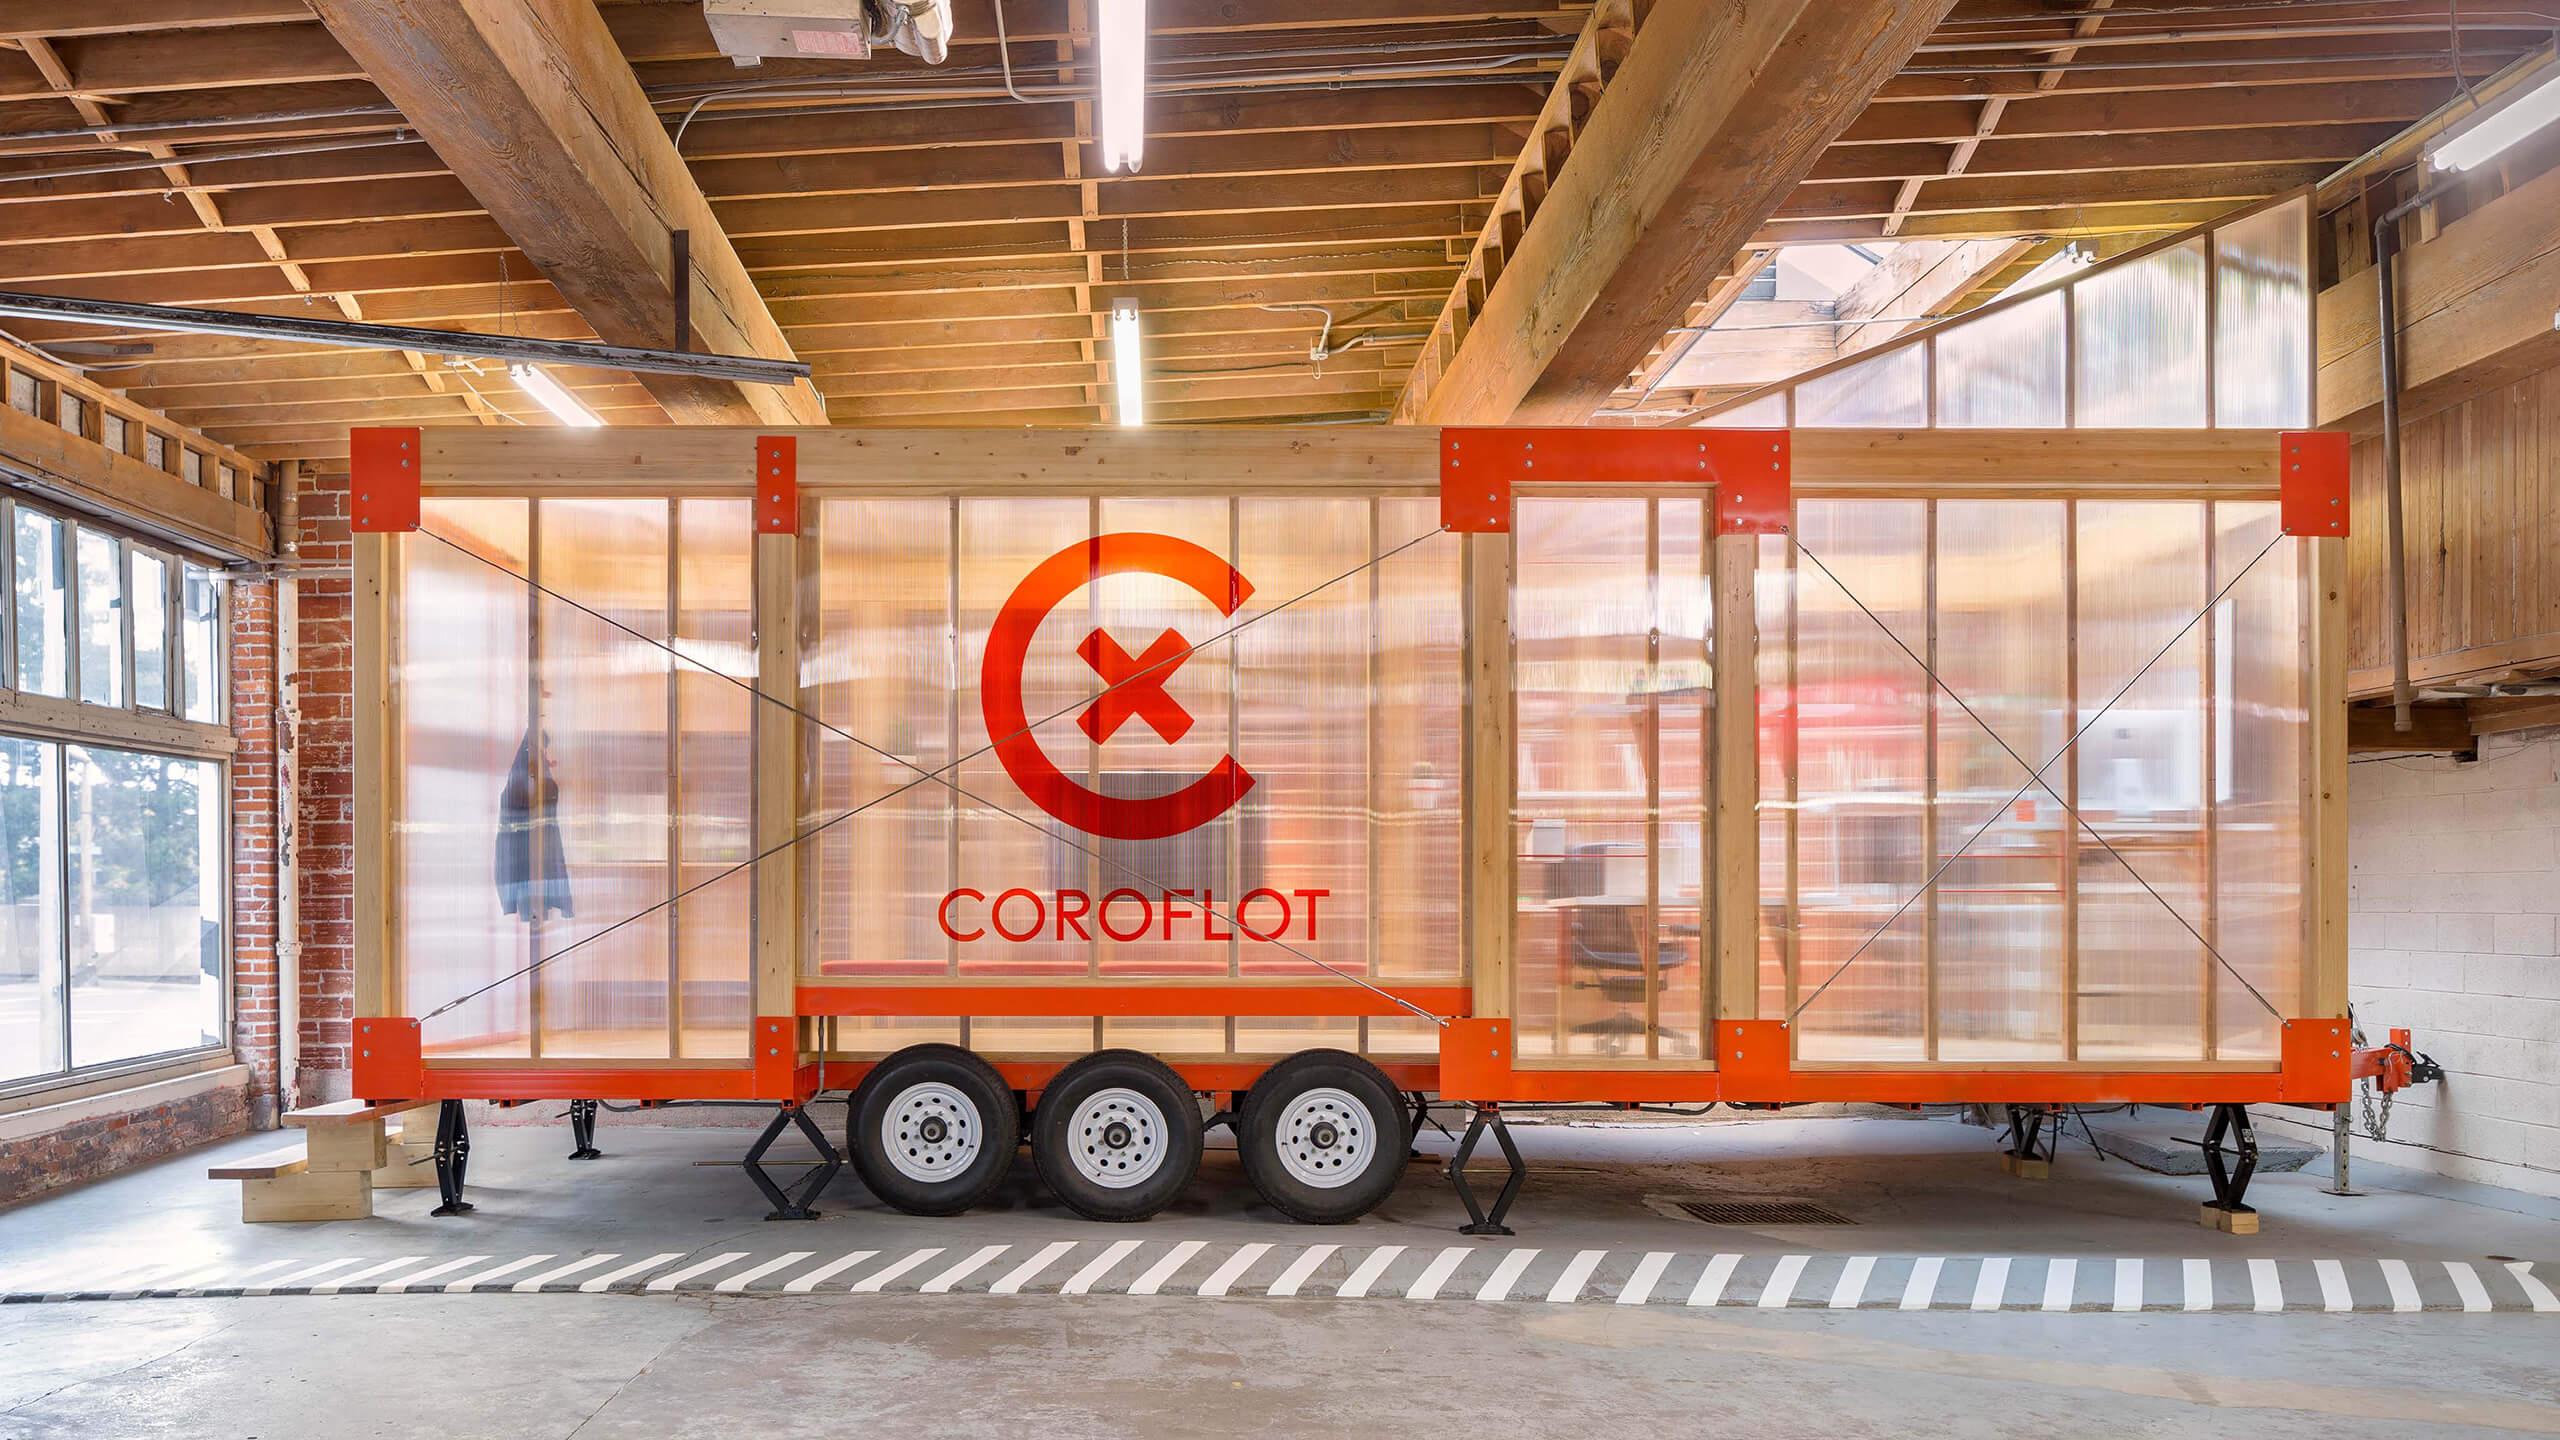 coroflot-mobile-work-unit